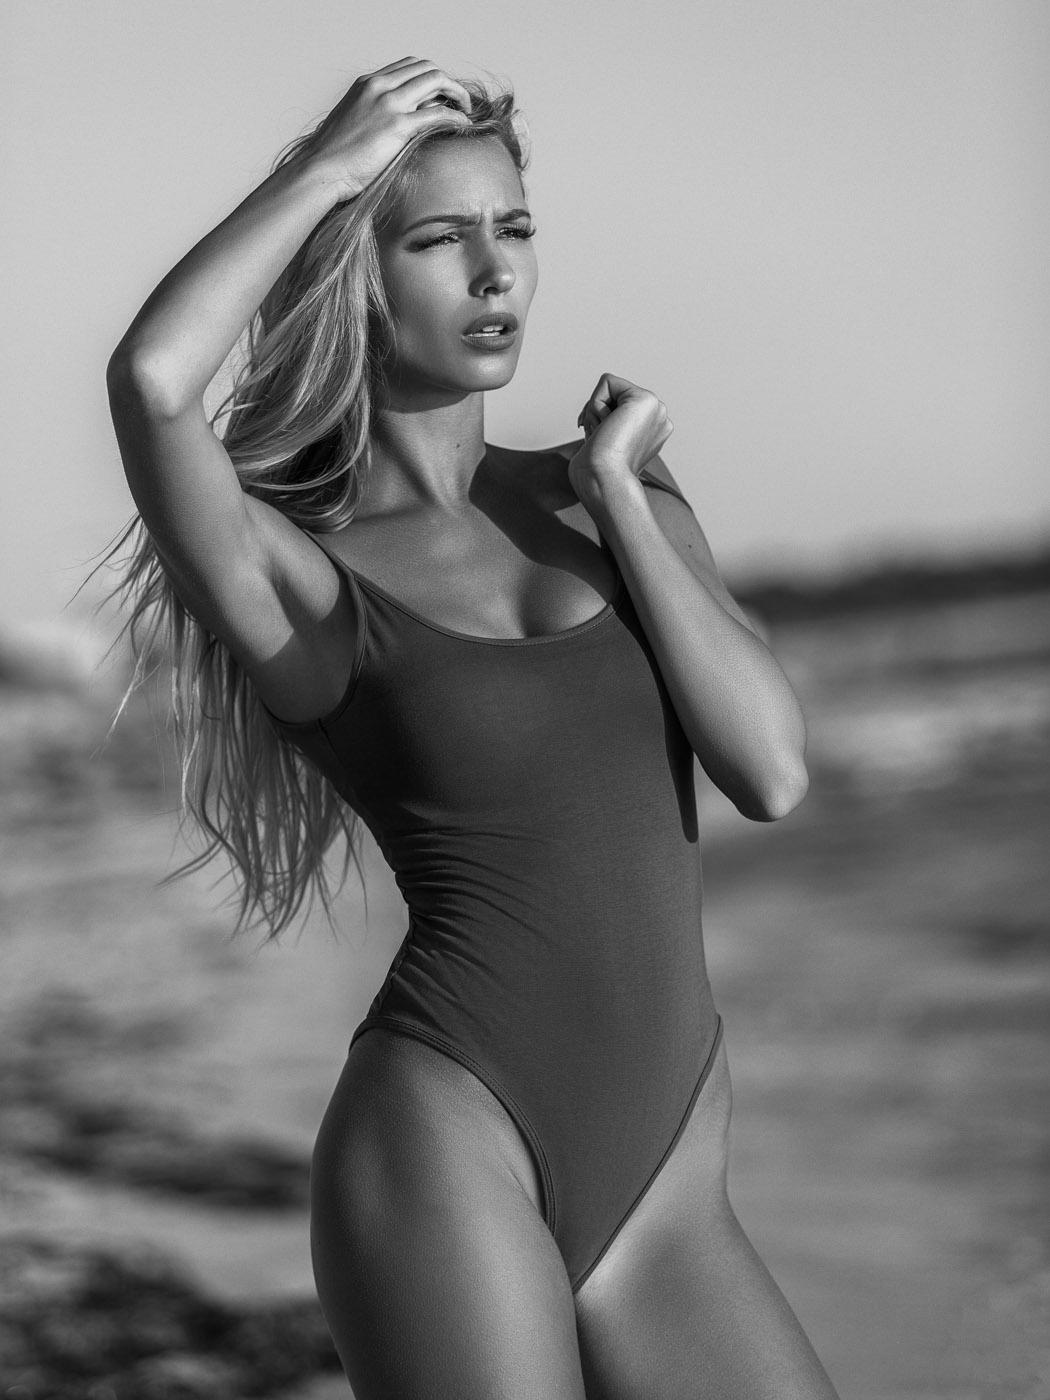 Yara-Sophie Women  Yara-Sophie Pilgram photographer models model lionsmag lions magazine editorial body blackandwhite bikini beachwear babes Axel Heinrichs   // lionsmag.com - premium nude photography magazine